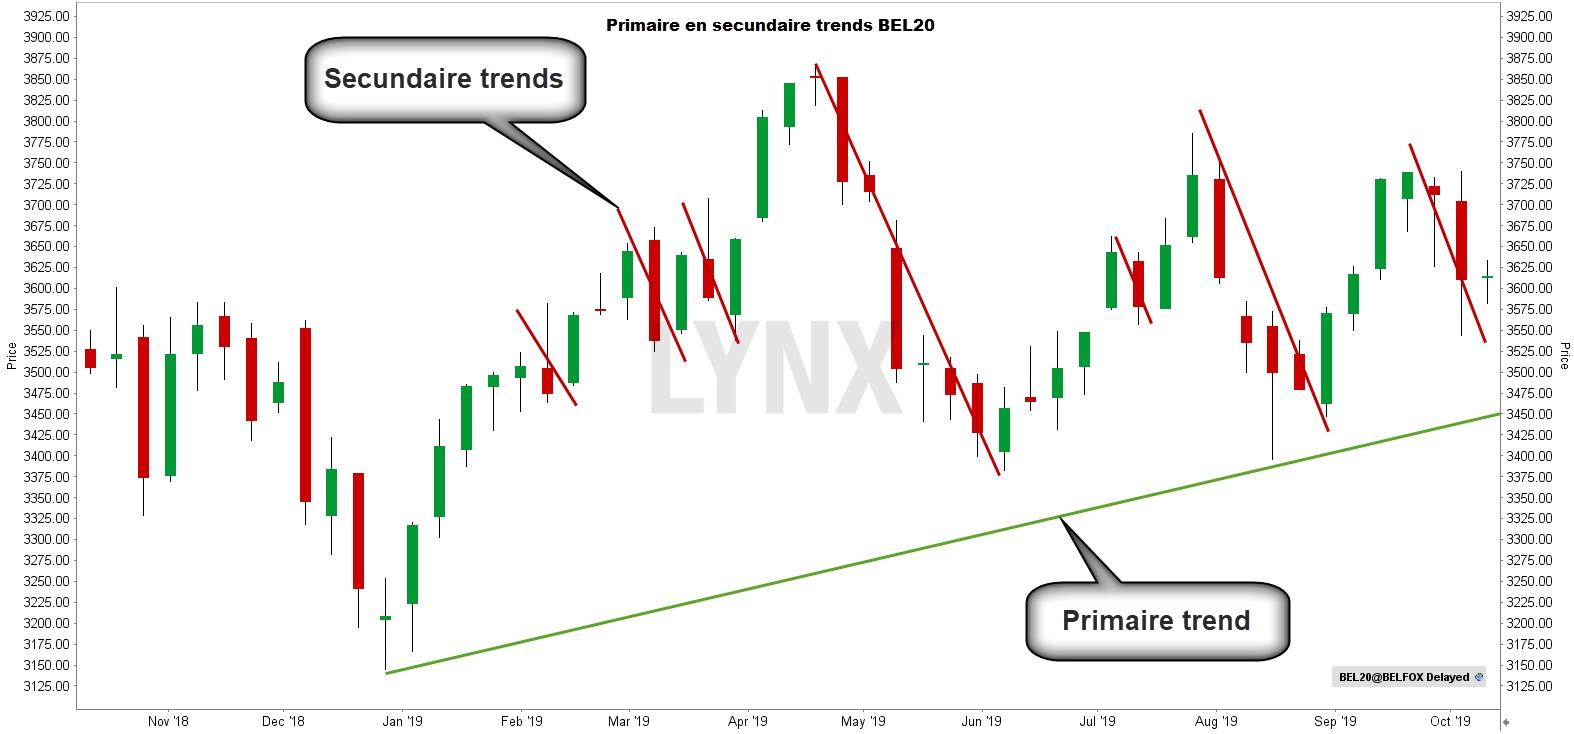 Dow Theorie - Primaire en secundaire trends